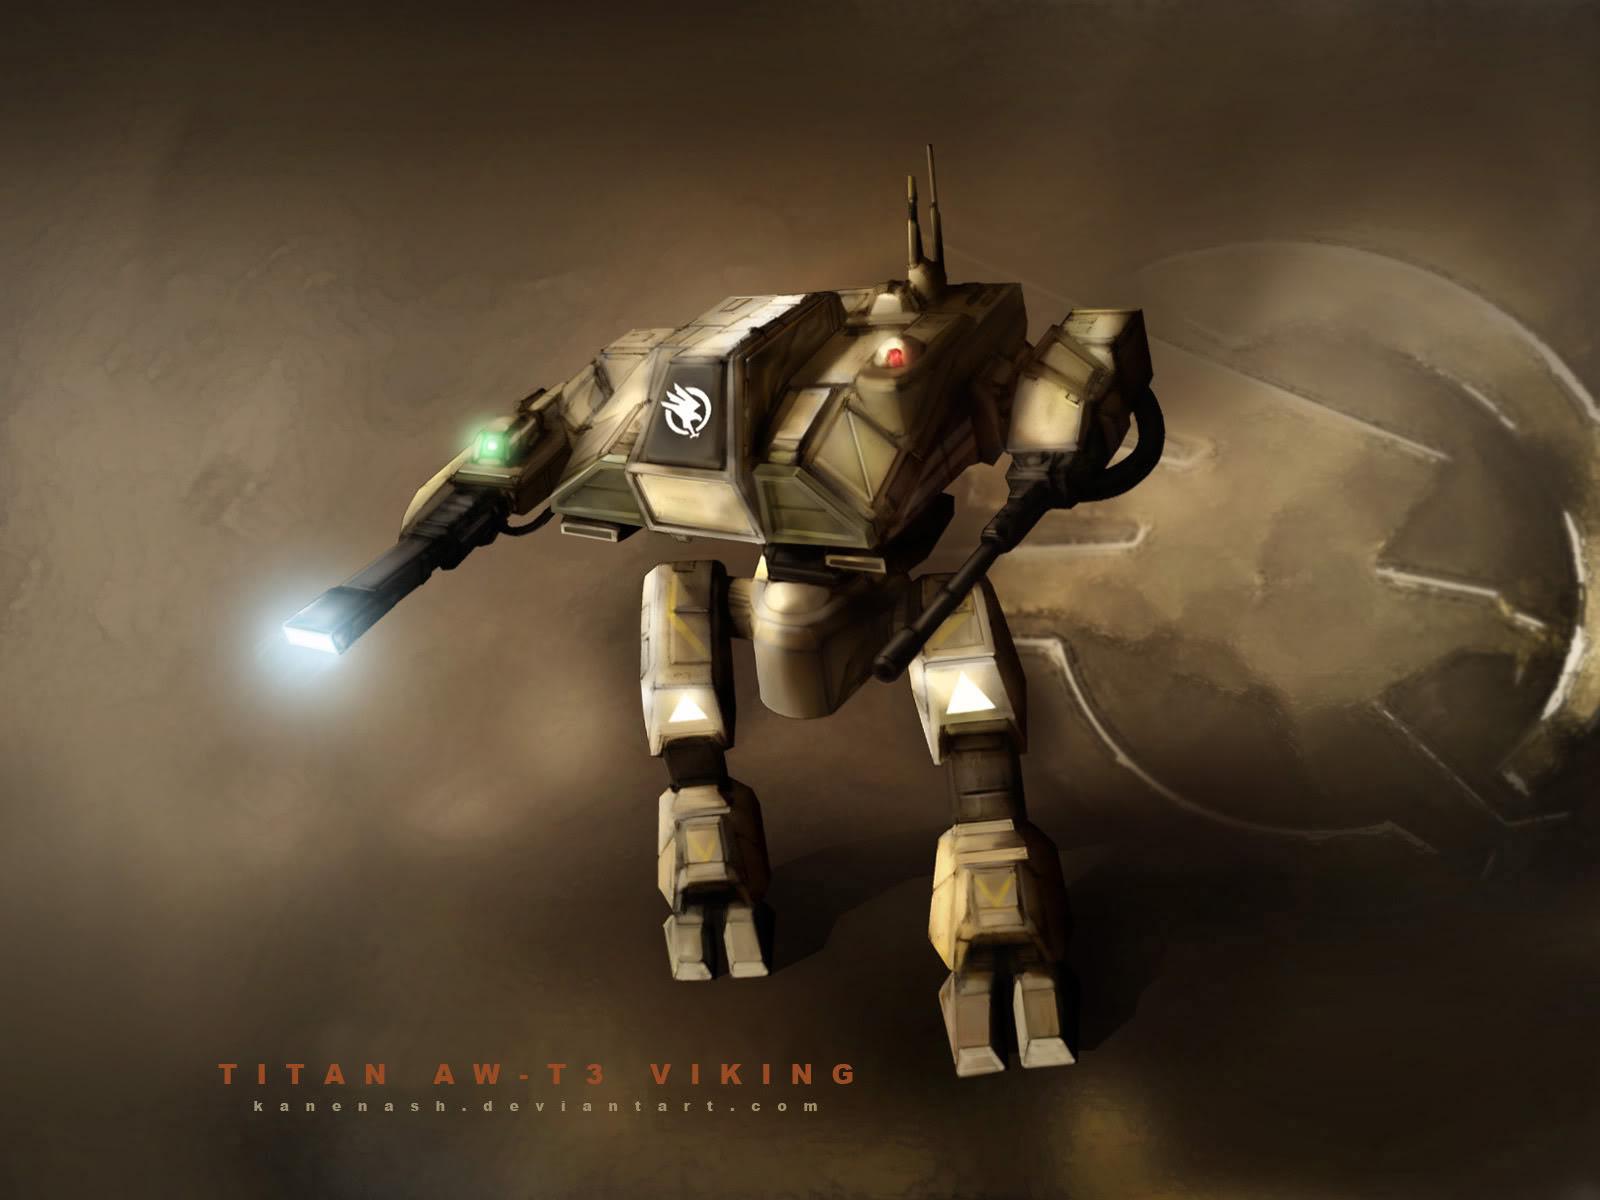 Titan AW-T3 Viking by KaneNash